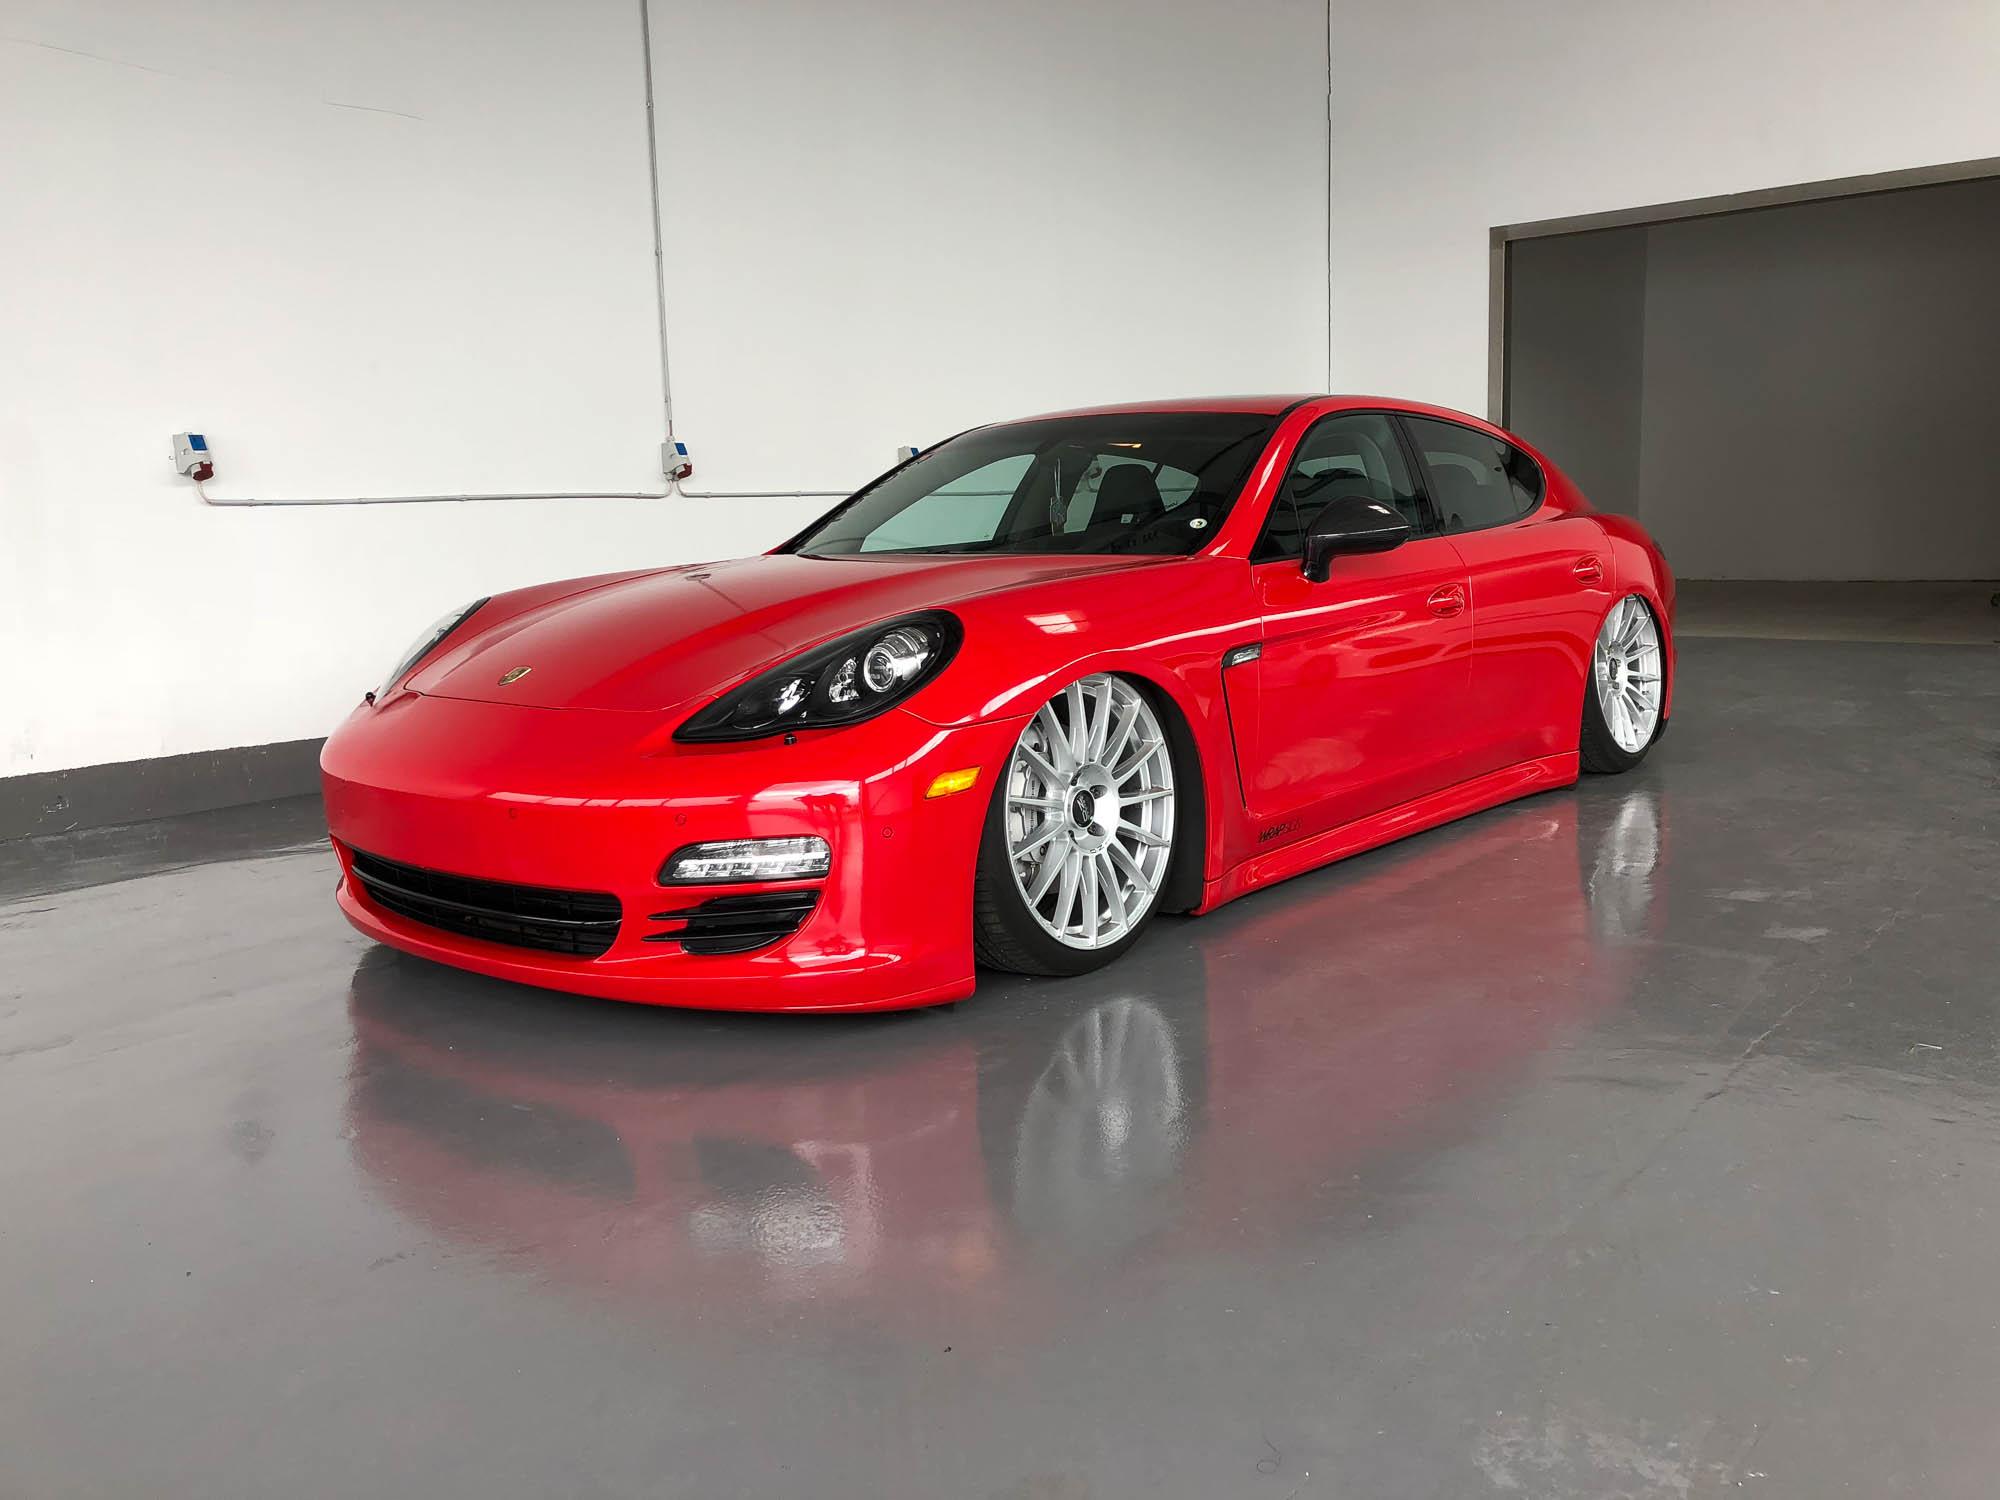 Porsche Panamera in Avery Carmine red gloss